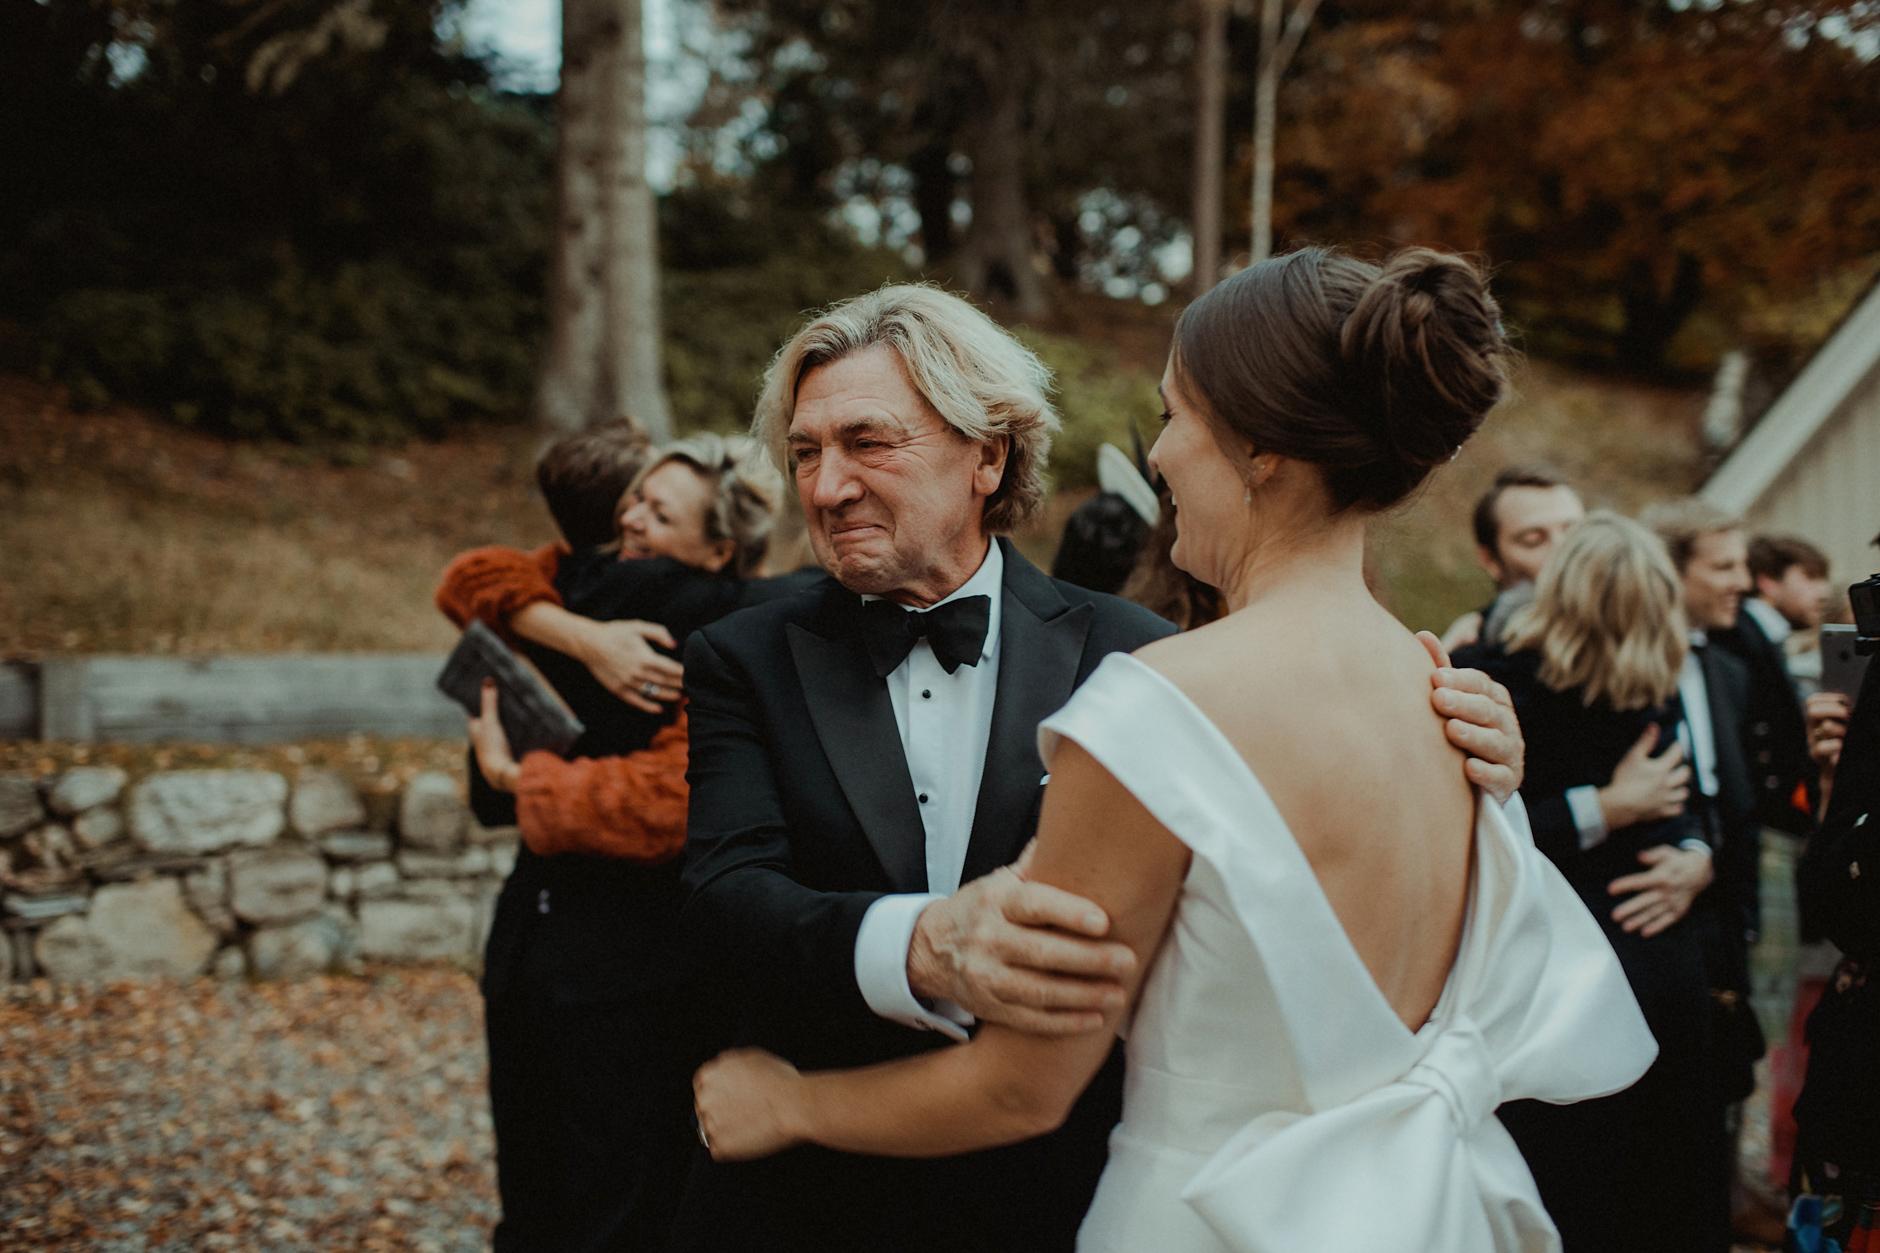 Glentruim-Wedding-Nikki-Leadbetter-Photography-119.jpg